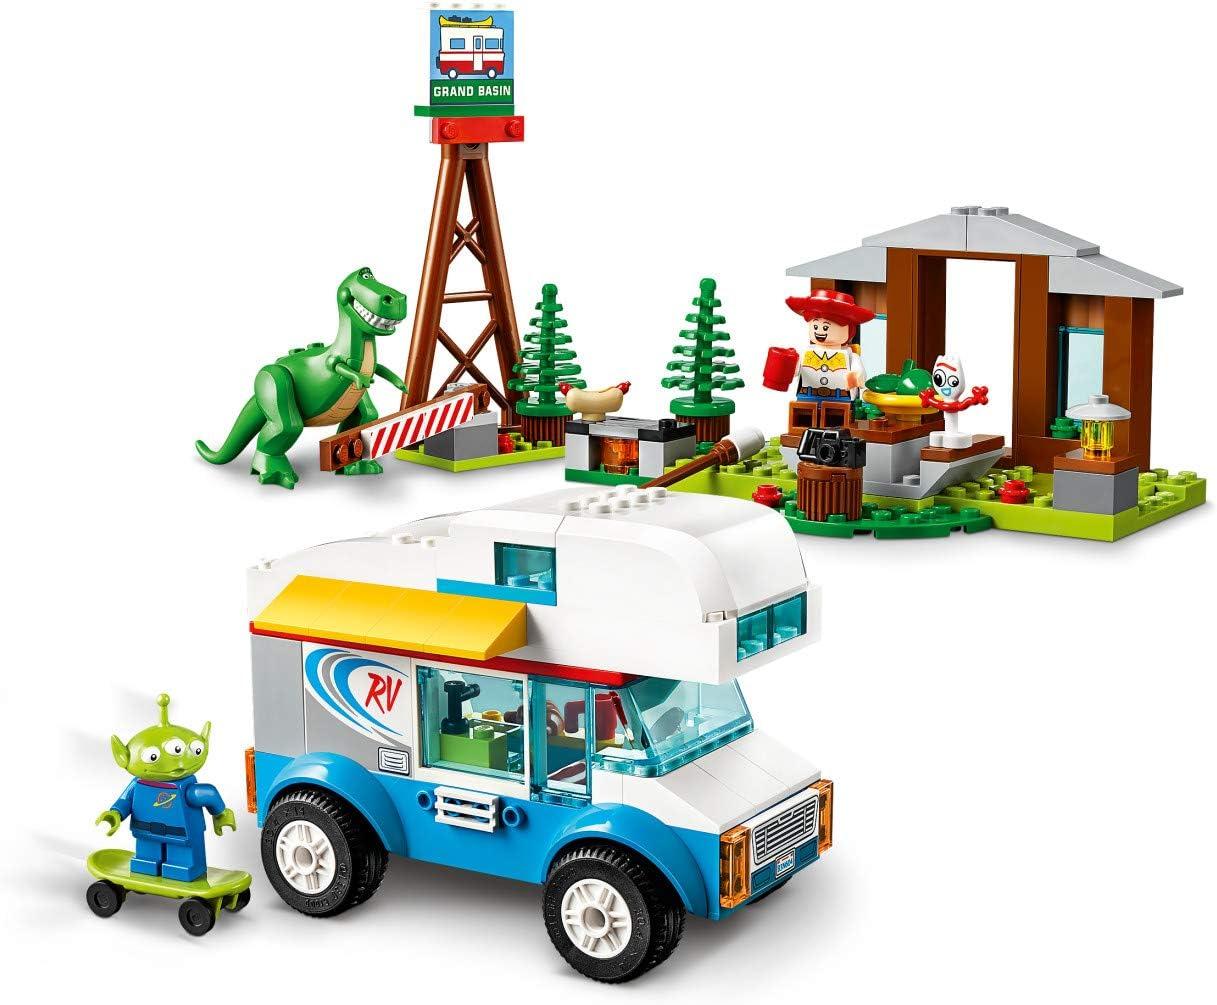 LEGO Disney Pixar/'s Toy Story 4 RV Vacation 10769 Building Kit 178 Pieces